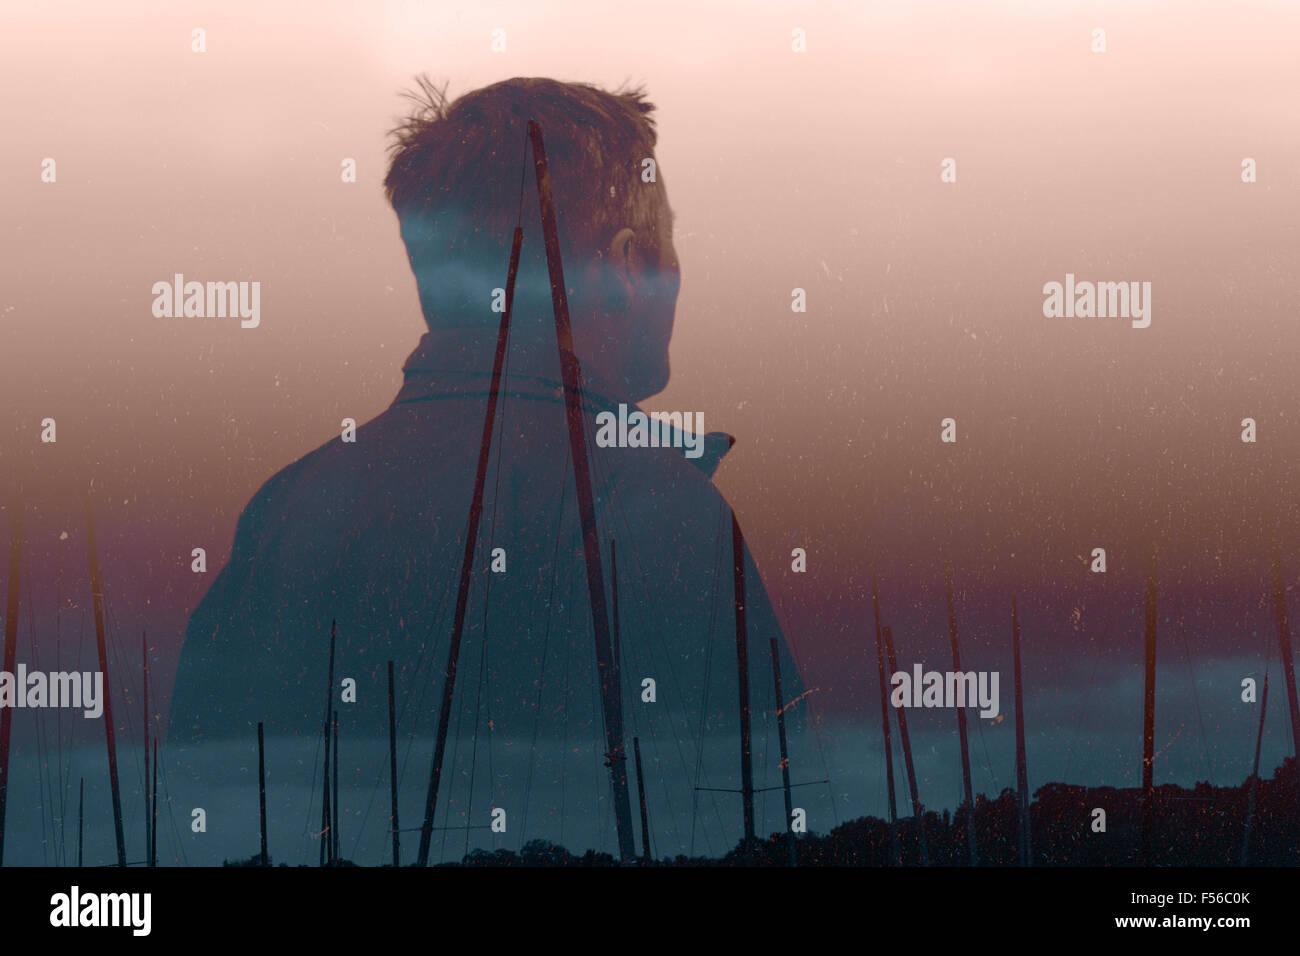 Fisherman double exposed with boasting masts - Stock Image